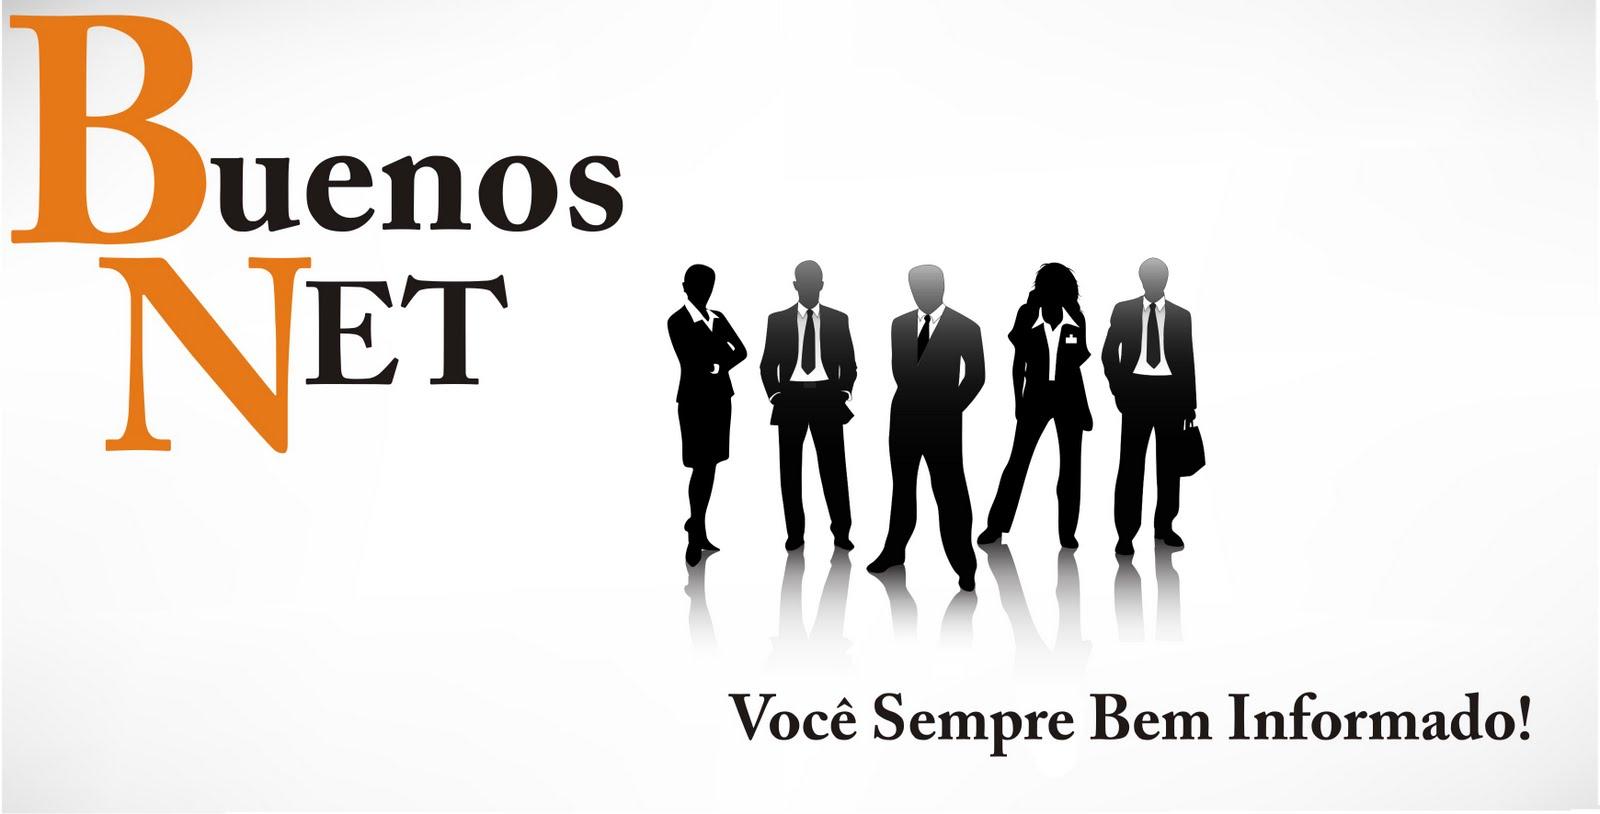 Buenos NET